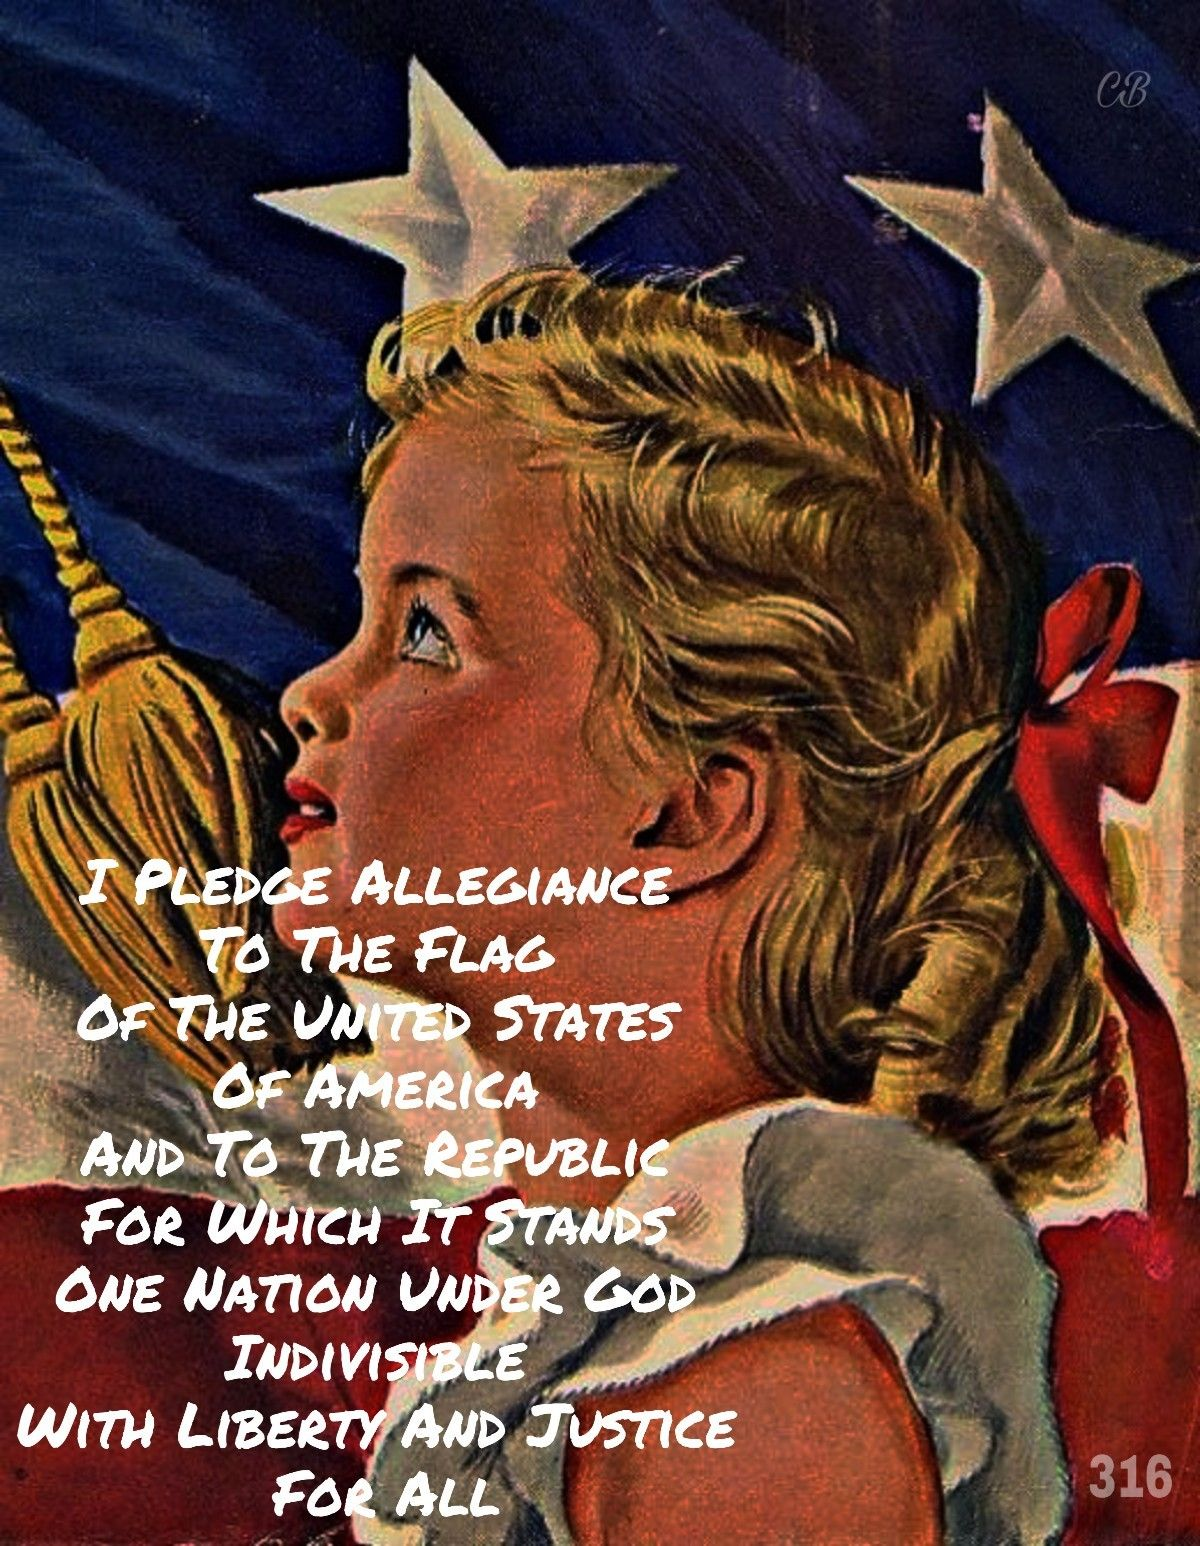 Pin By Chris Binder On Pledge Of Allegiance